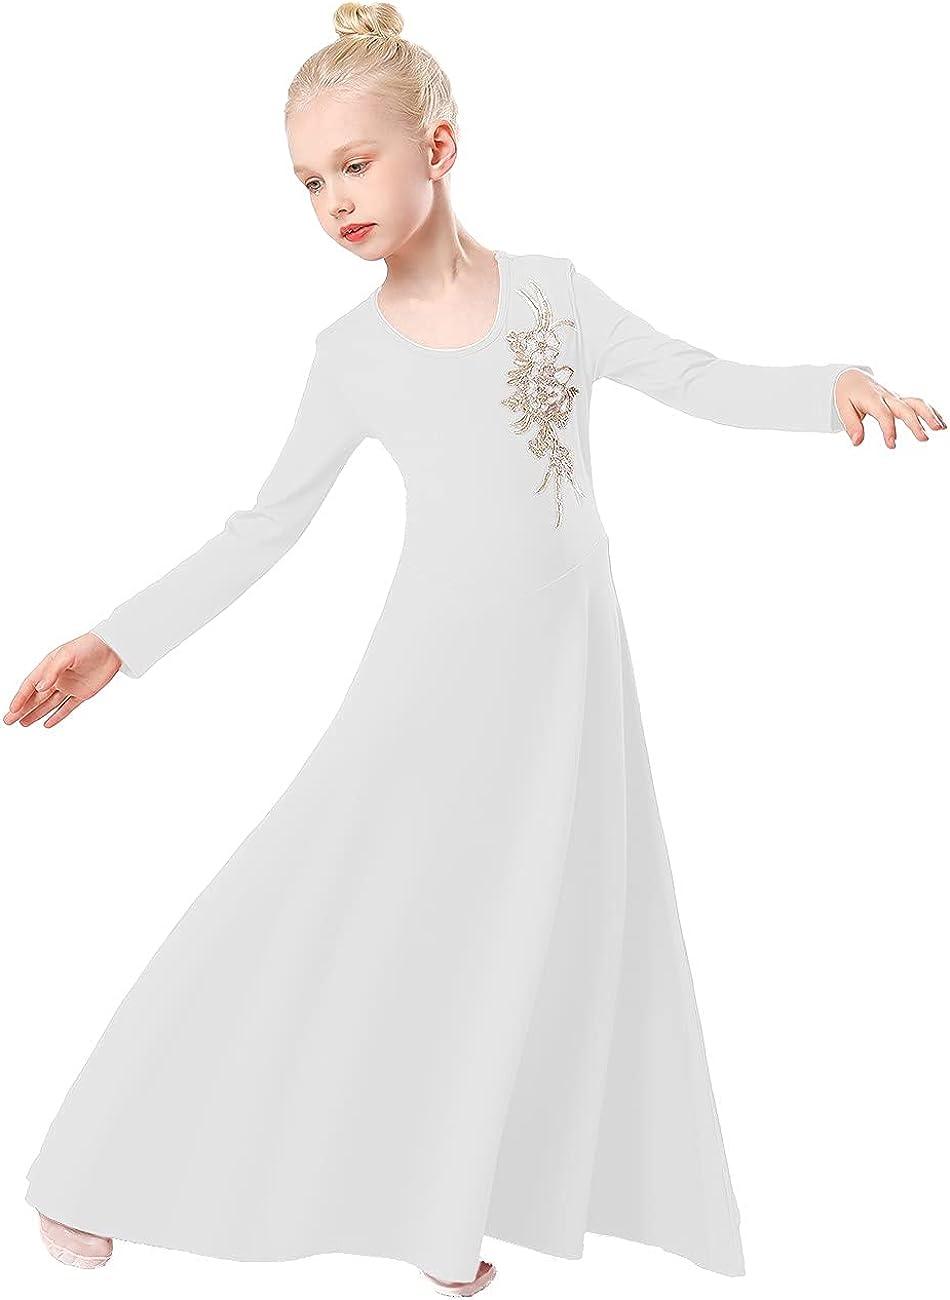 REXREII wholesale Girls Long Sleeve Worship Danc trust Costume Liturgical Praise